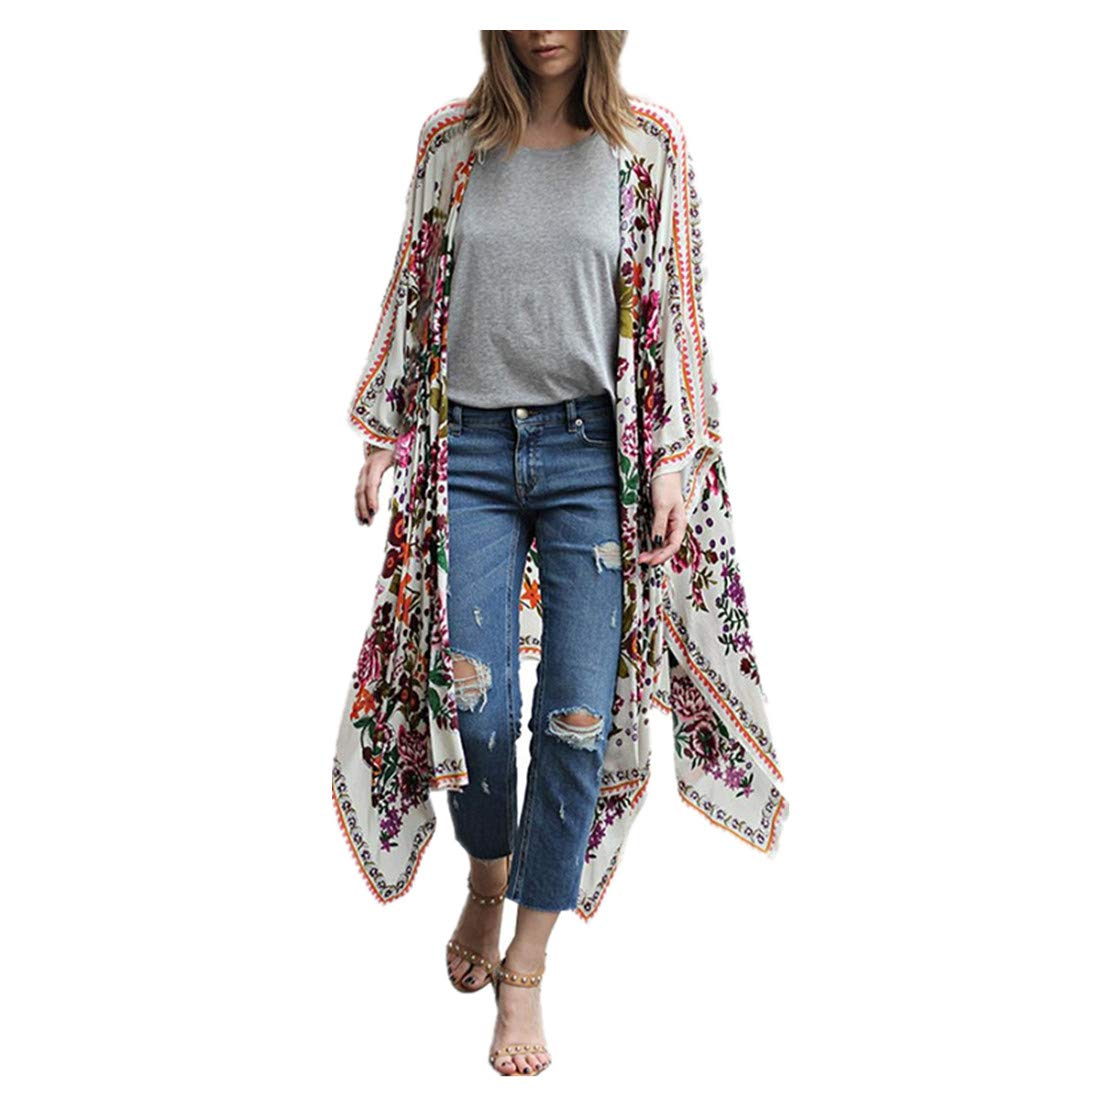 Damen Boho Bluse Cardigan Shirts Tops Hemd Blumen Strand Jacke Oberteil Mantel